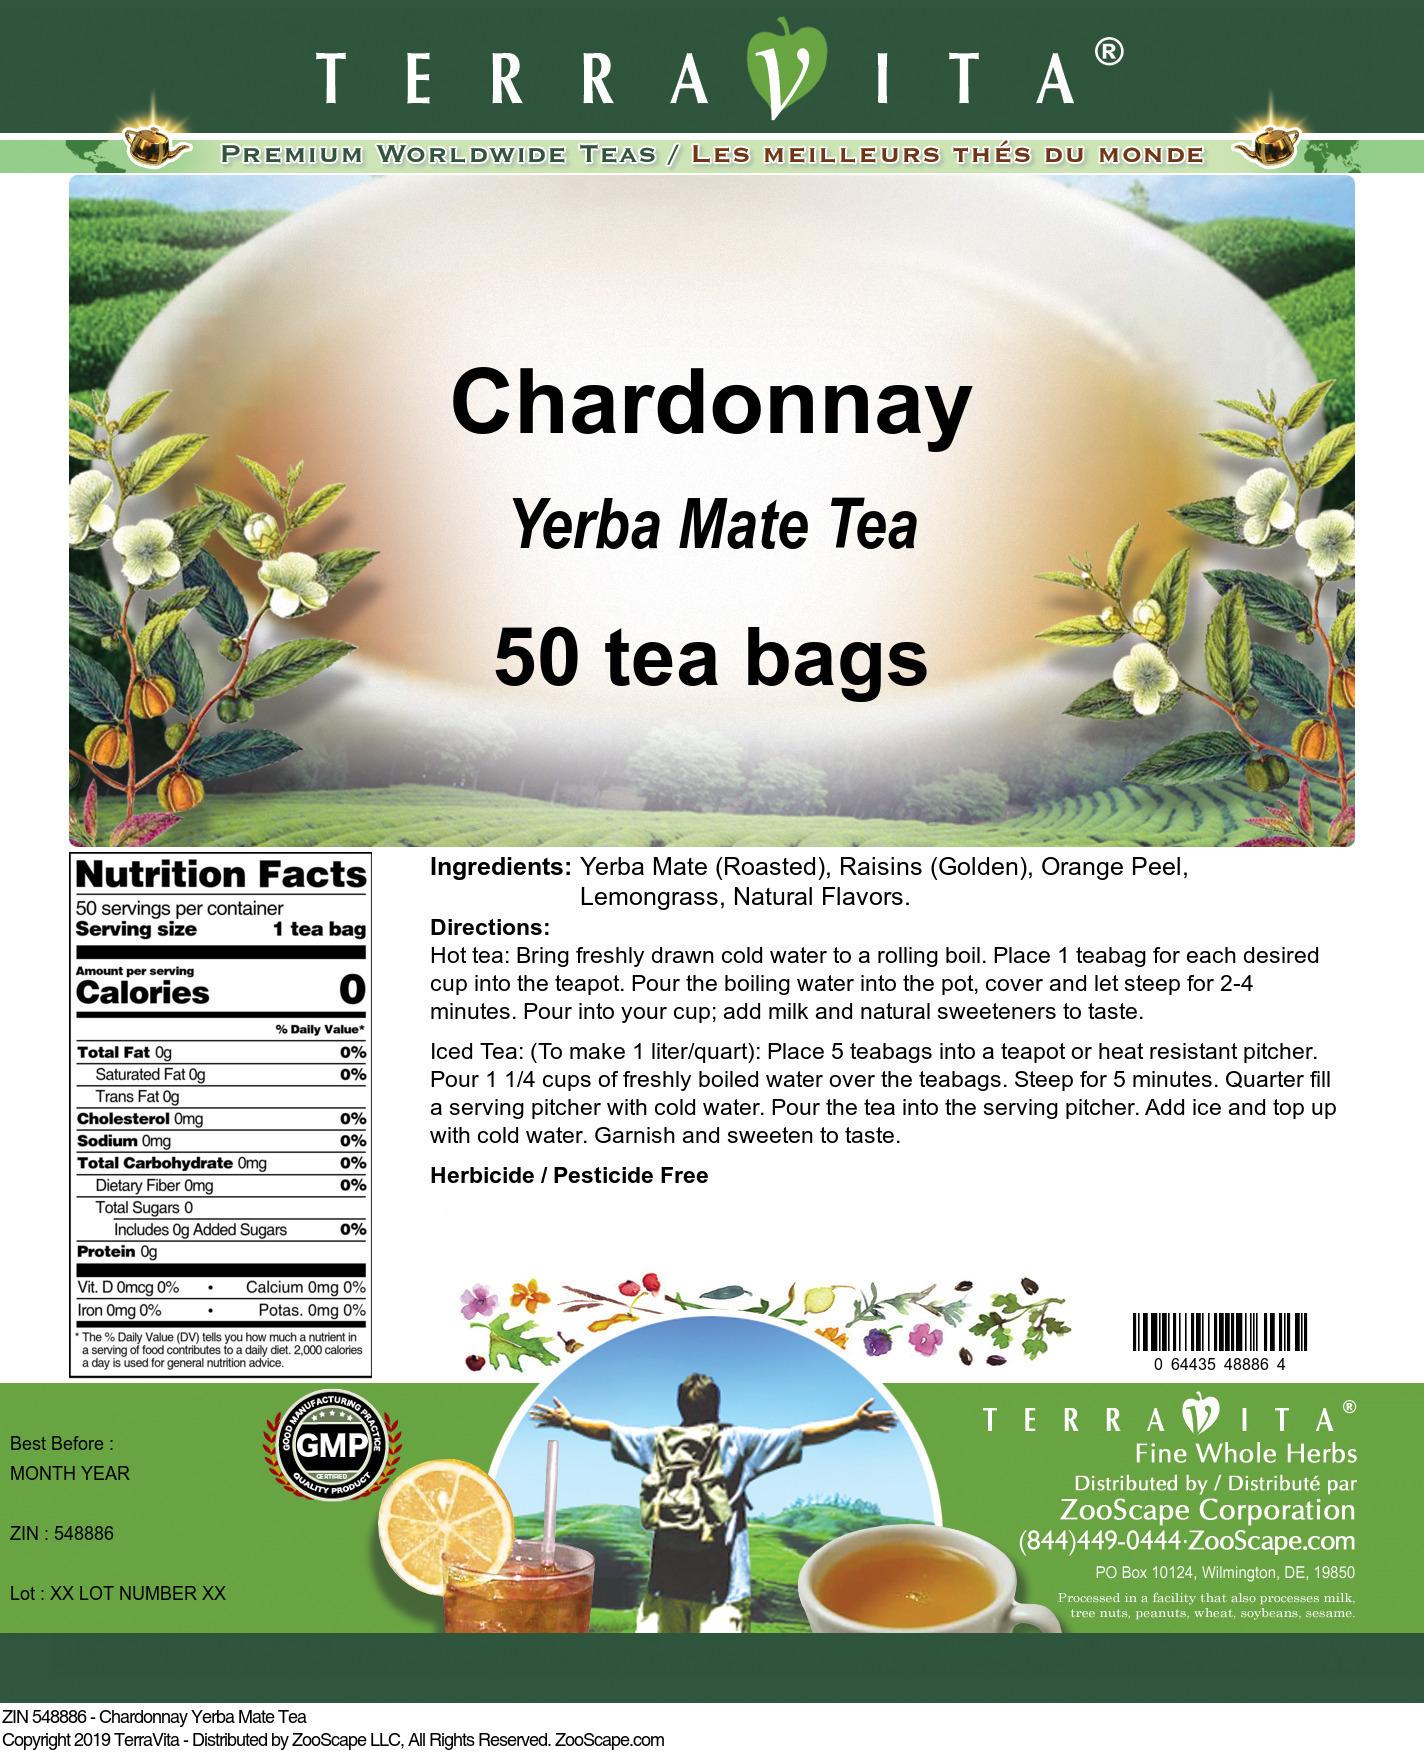 Chardonnay Yerba Mate Tea